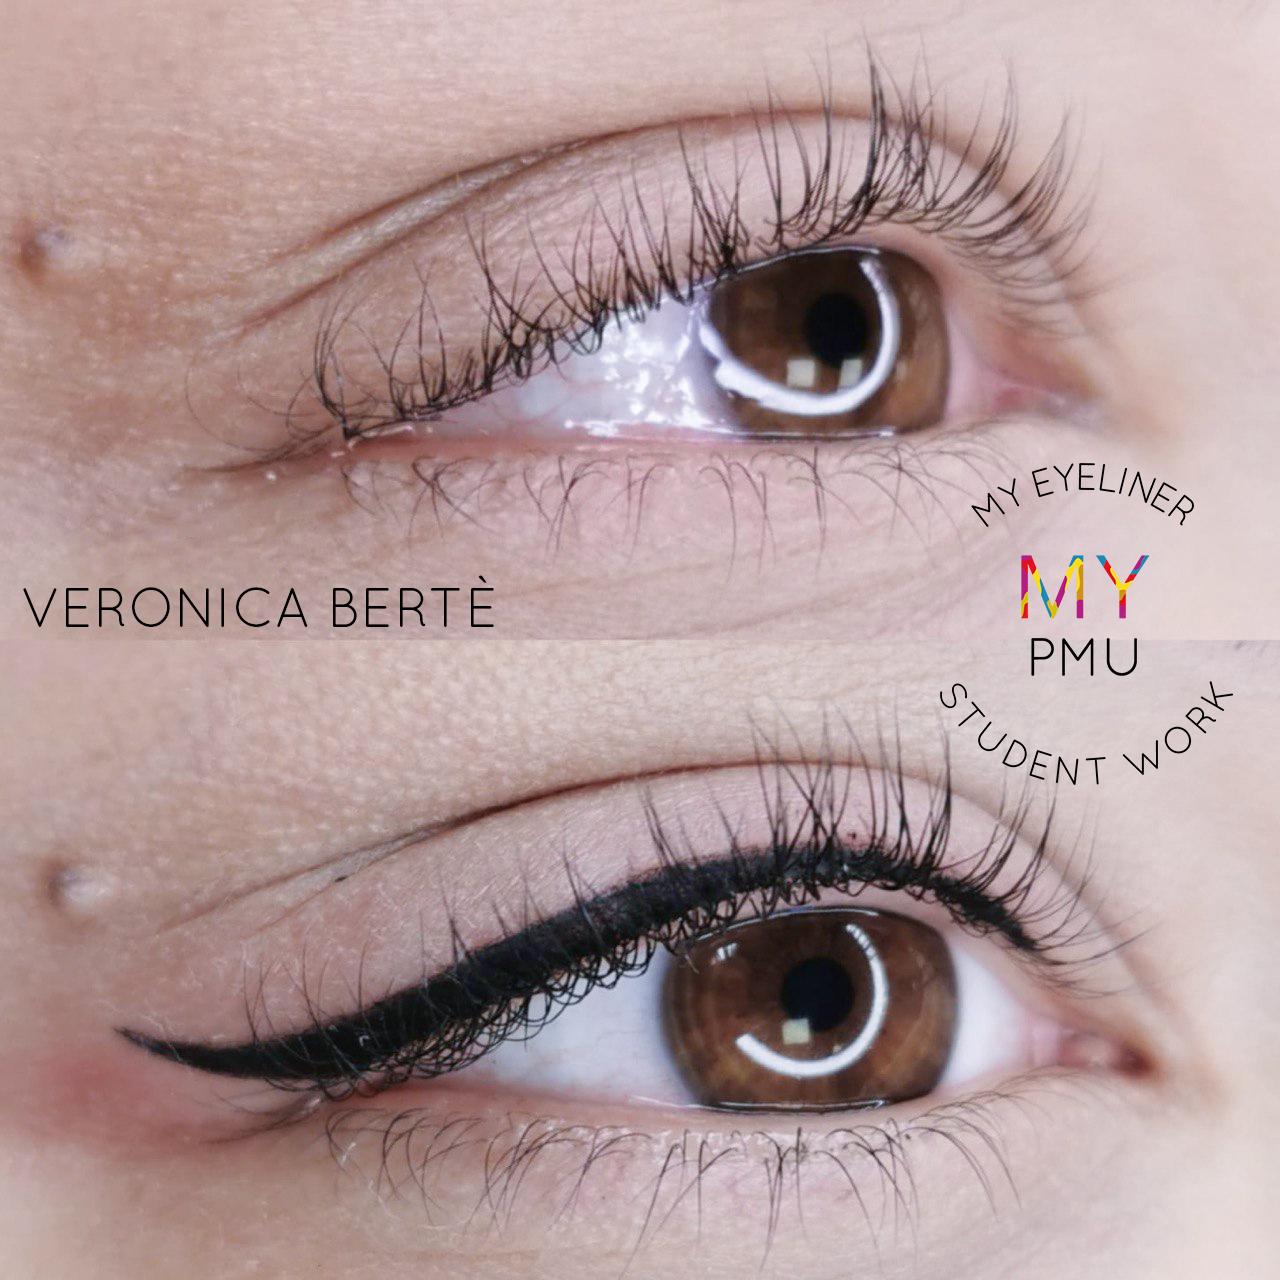 Lavoro allieve my eyeliner Bertè Veronica